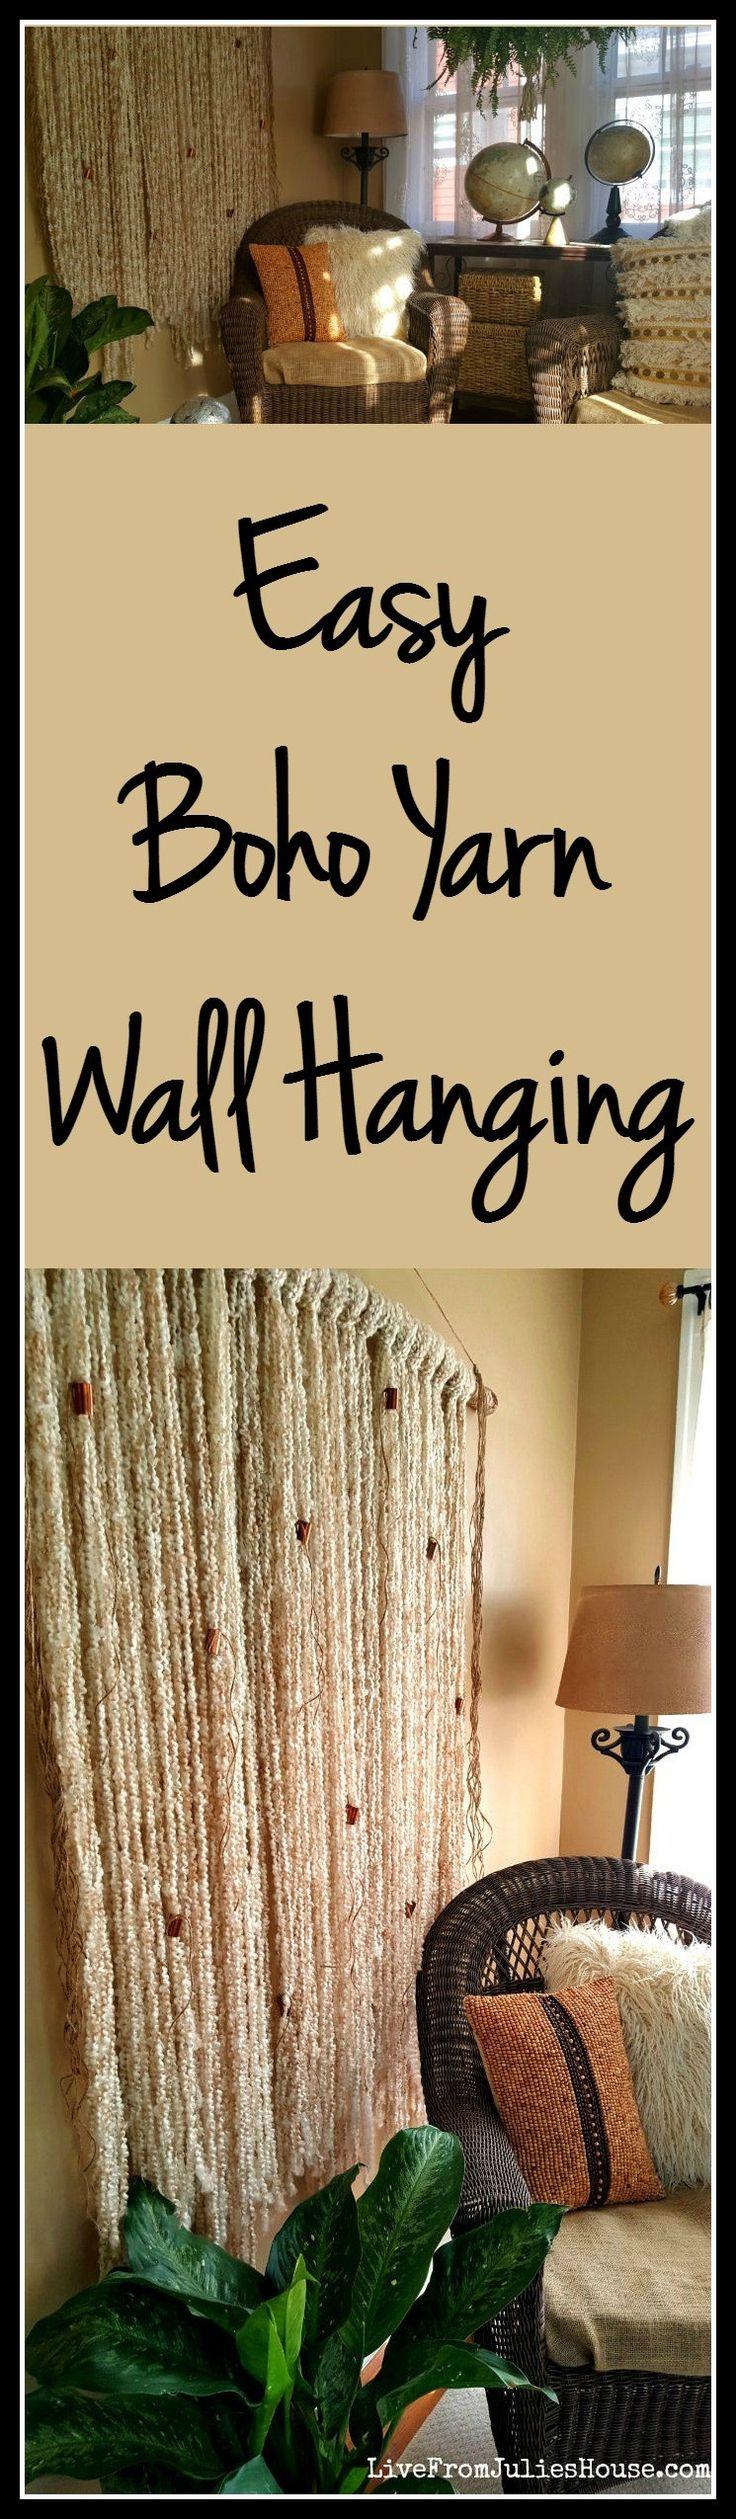 43 best Living Rooms I love images on Pinterest | Home decor, Living ...